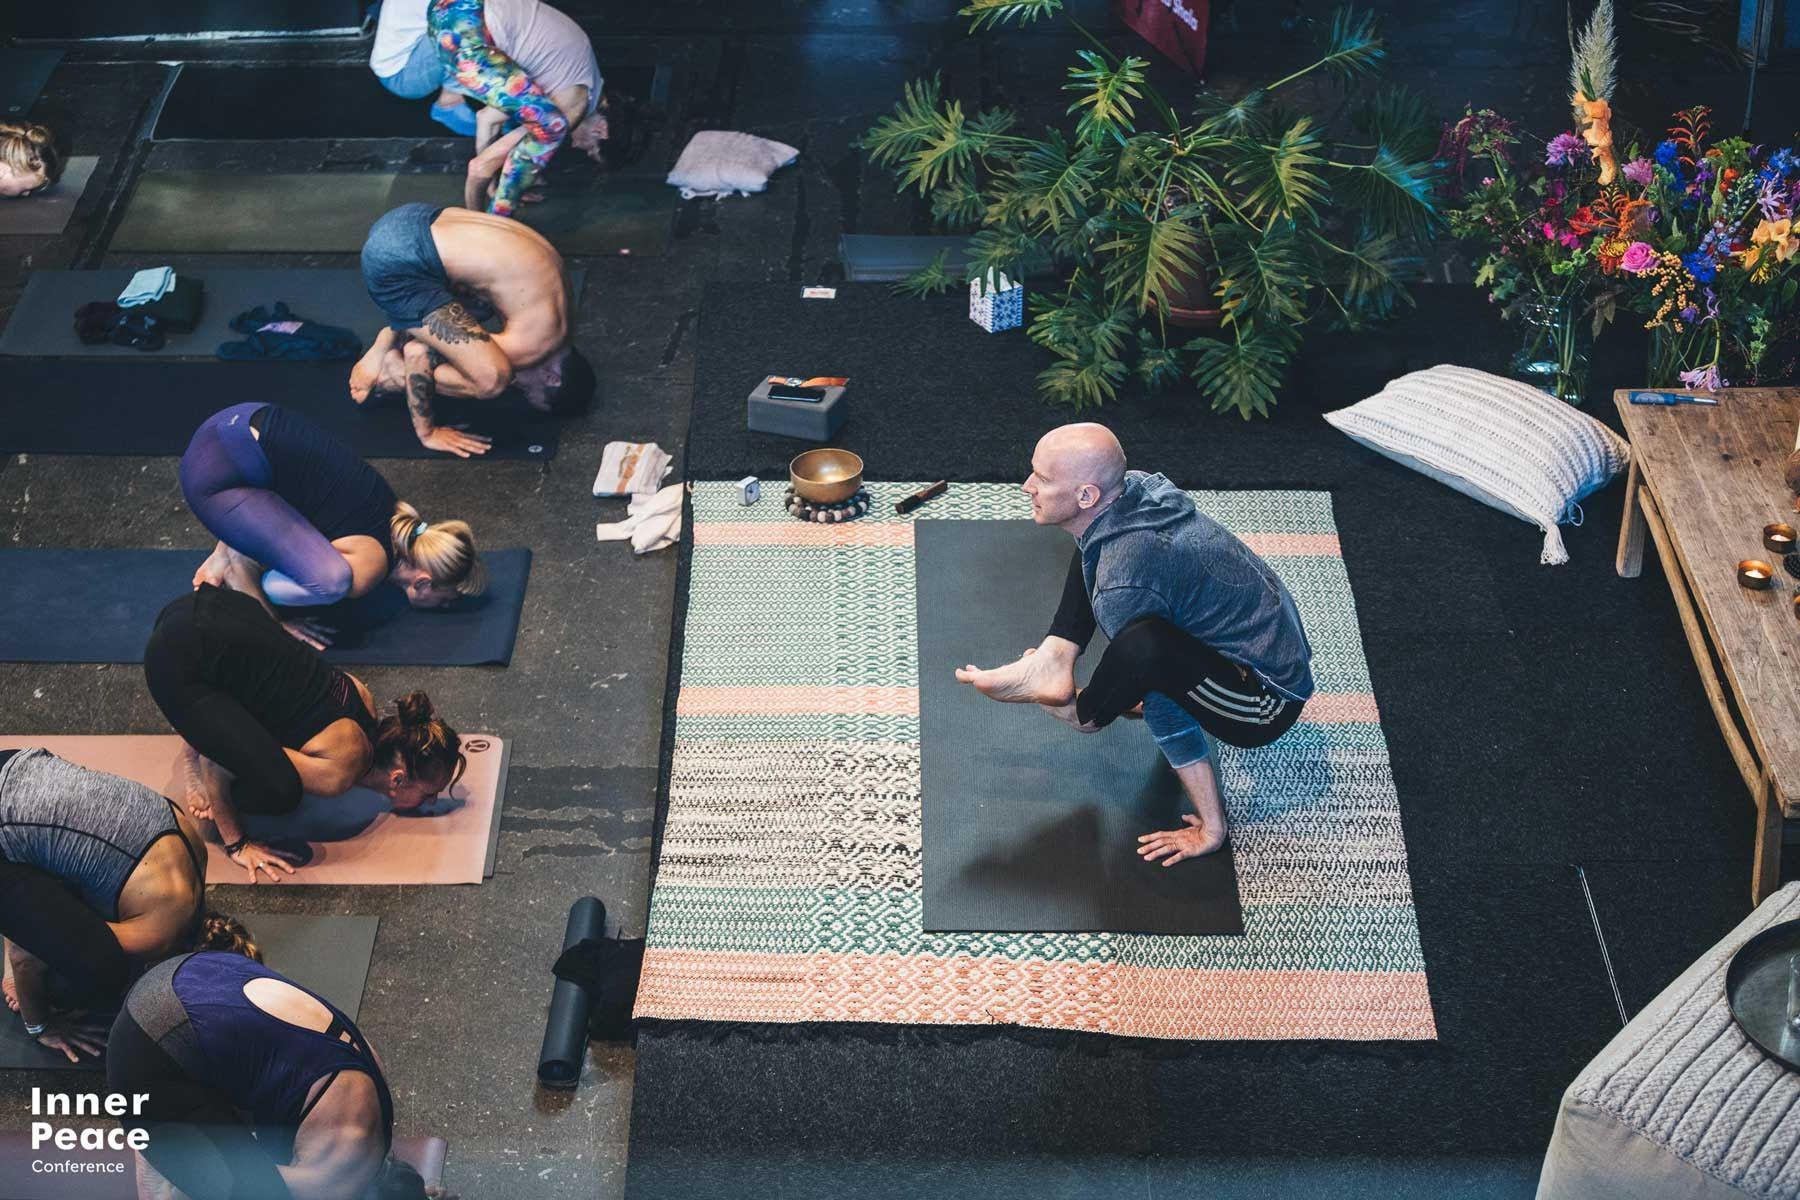 eddie stern, inner peace conference, yoga